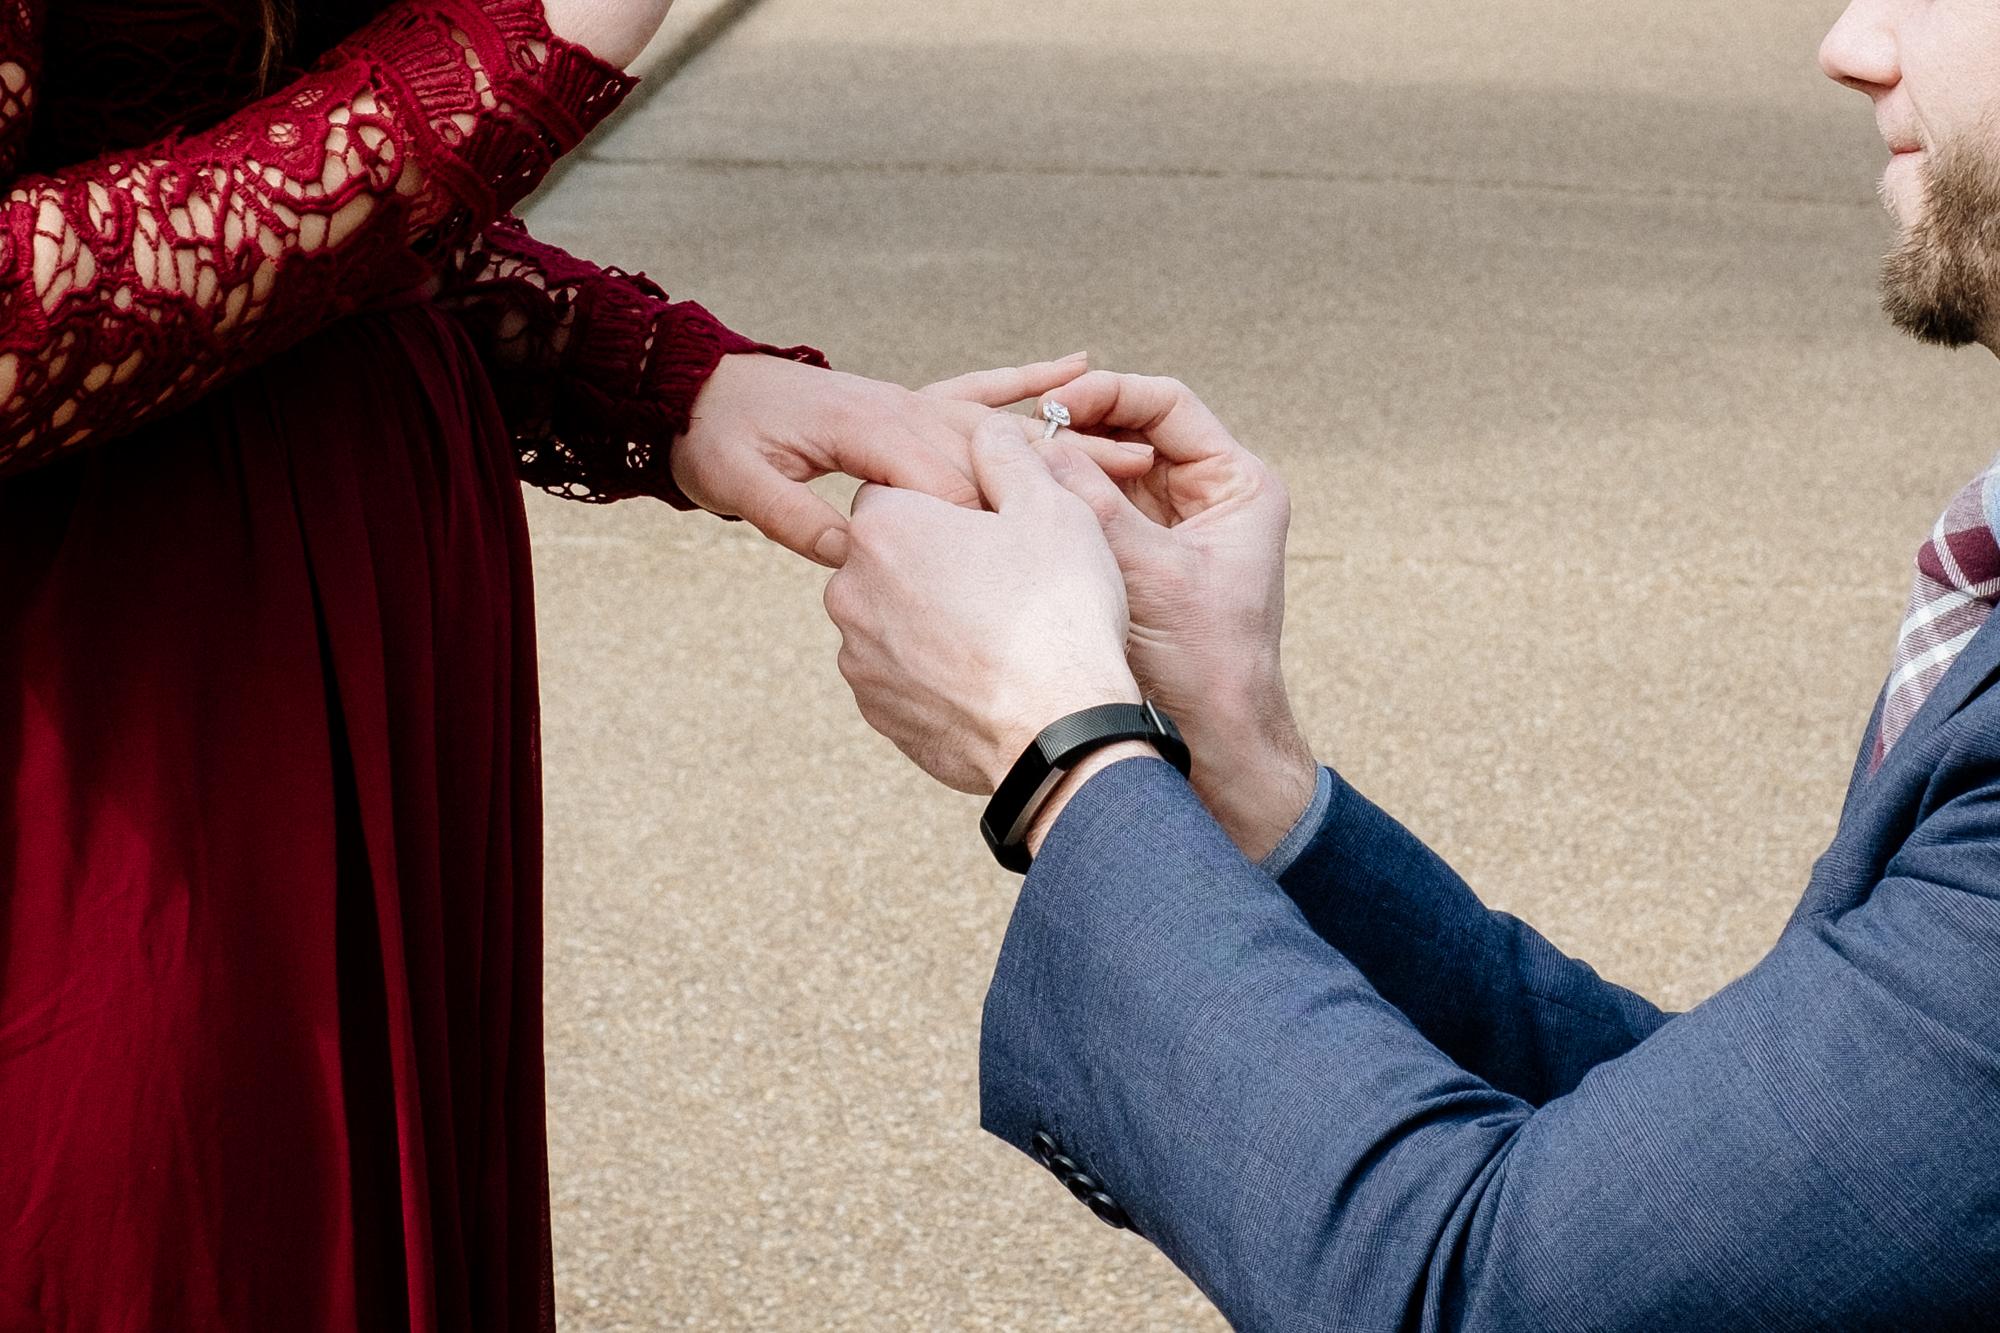 Jen_Montgomery_Photography_Angela_Brian_Engagement_Proposal_FB-14.jpg